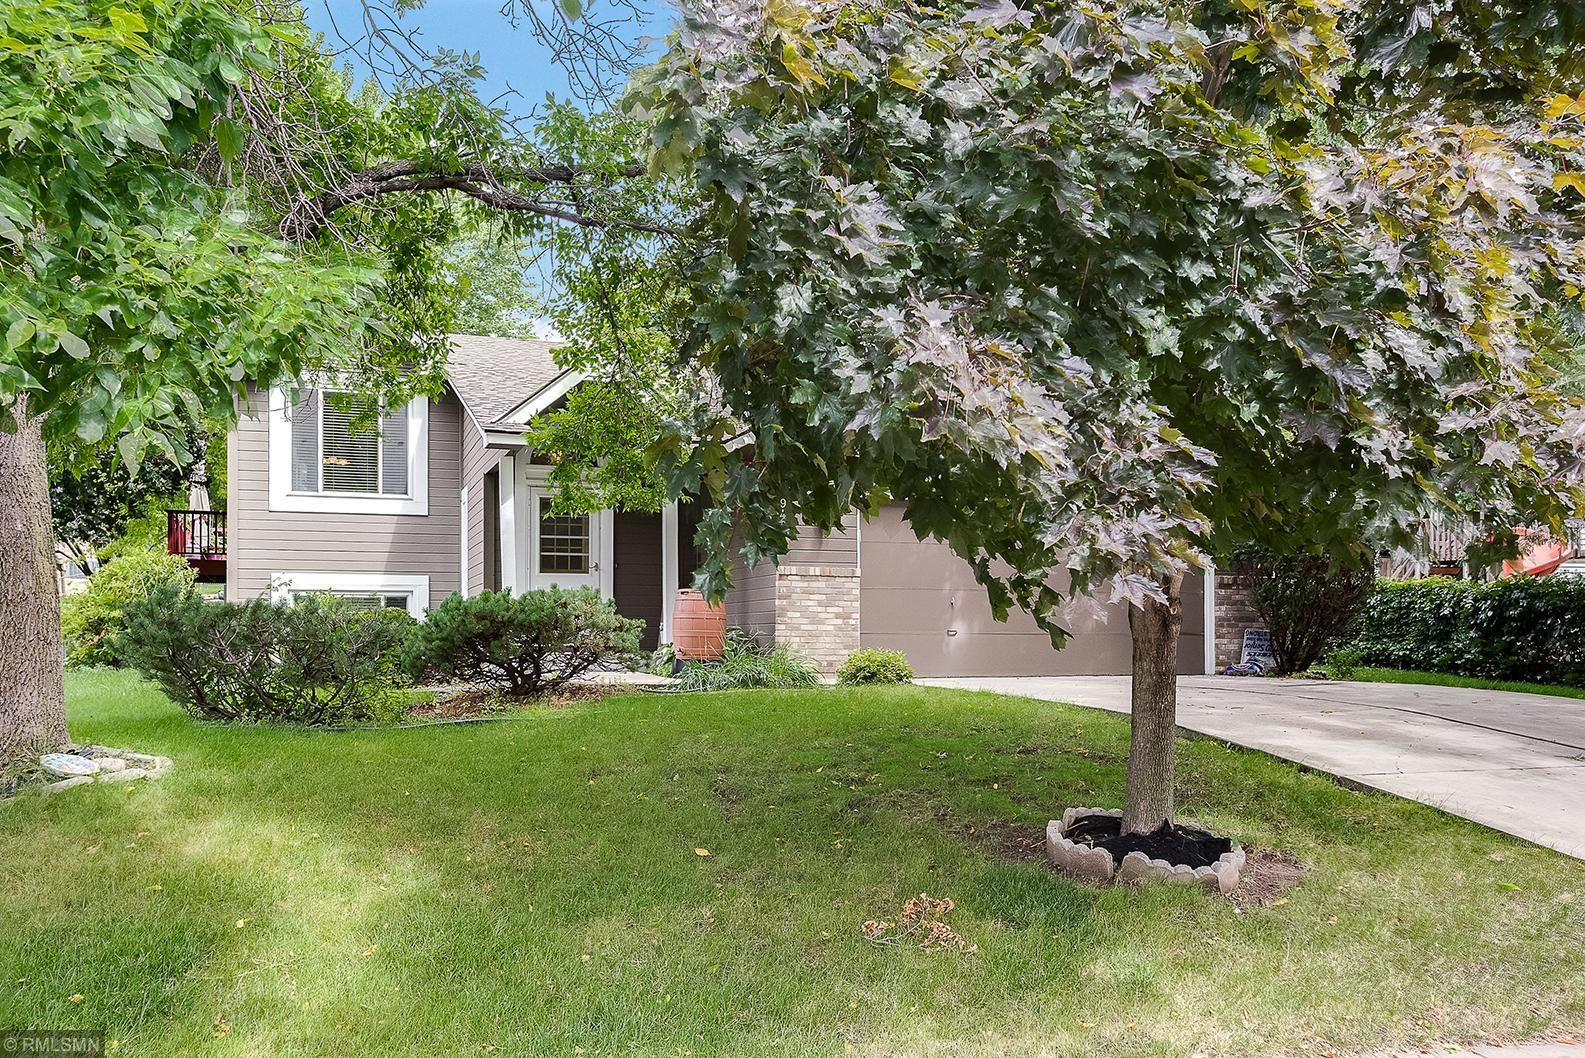 9462 Parkside Trail, Champlin, MN 55316 - MLS#: 5650141